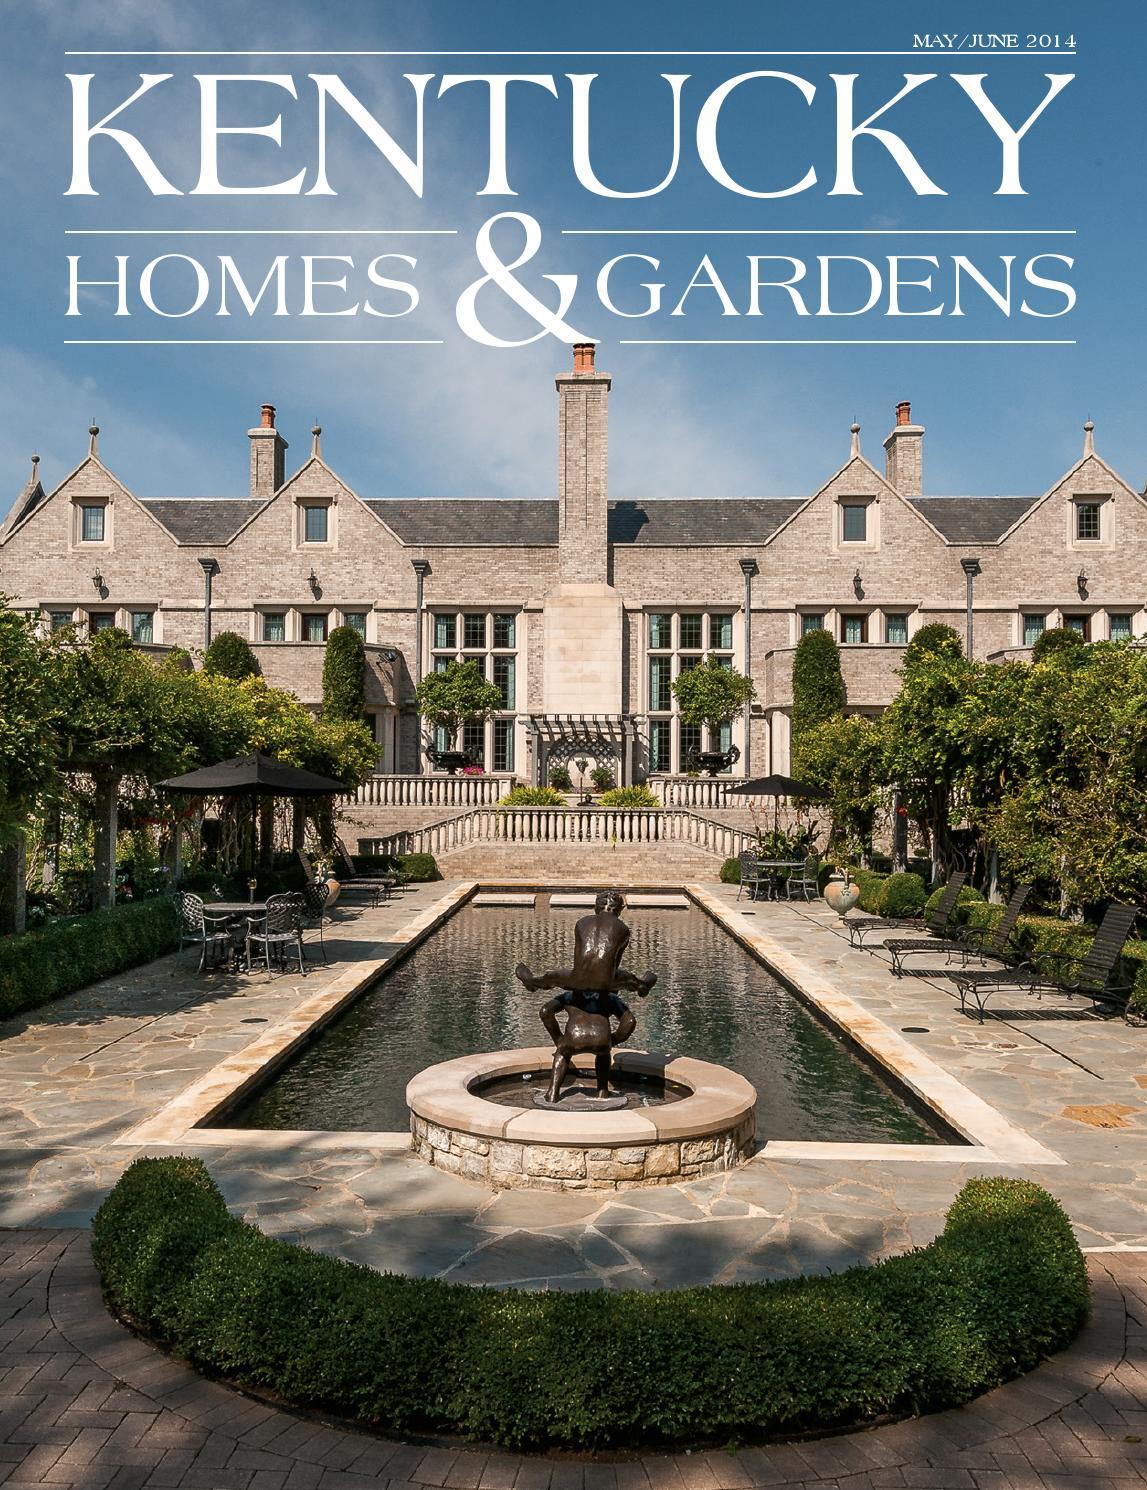 Kentucky homes gardens magazine by kentucky homes for Home builders kentucky